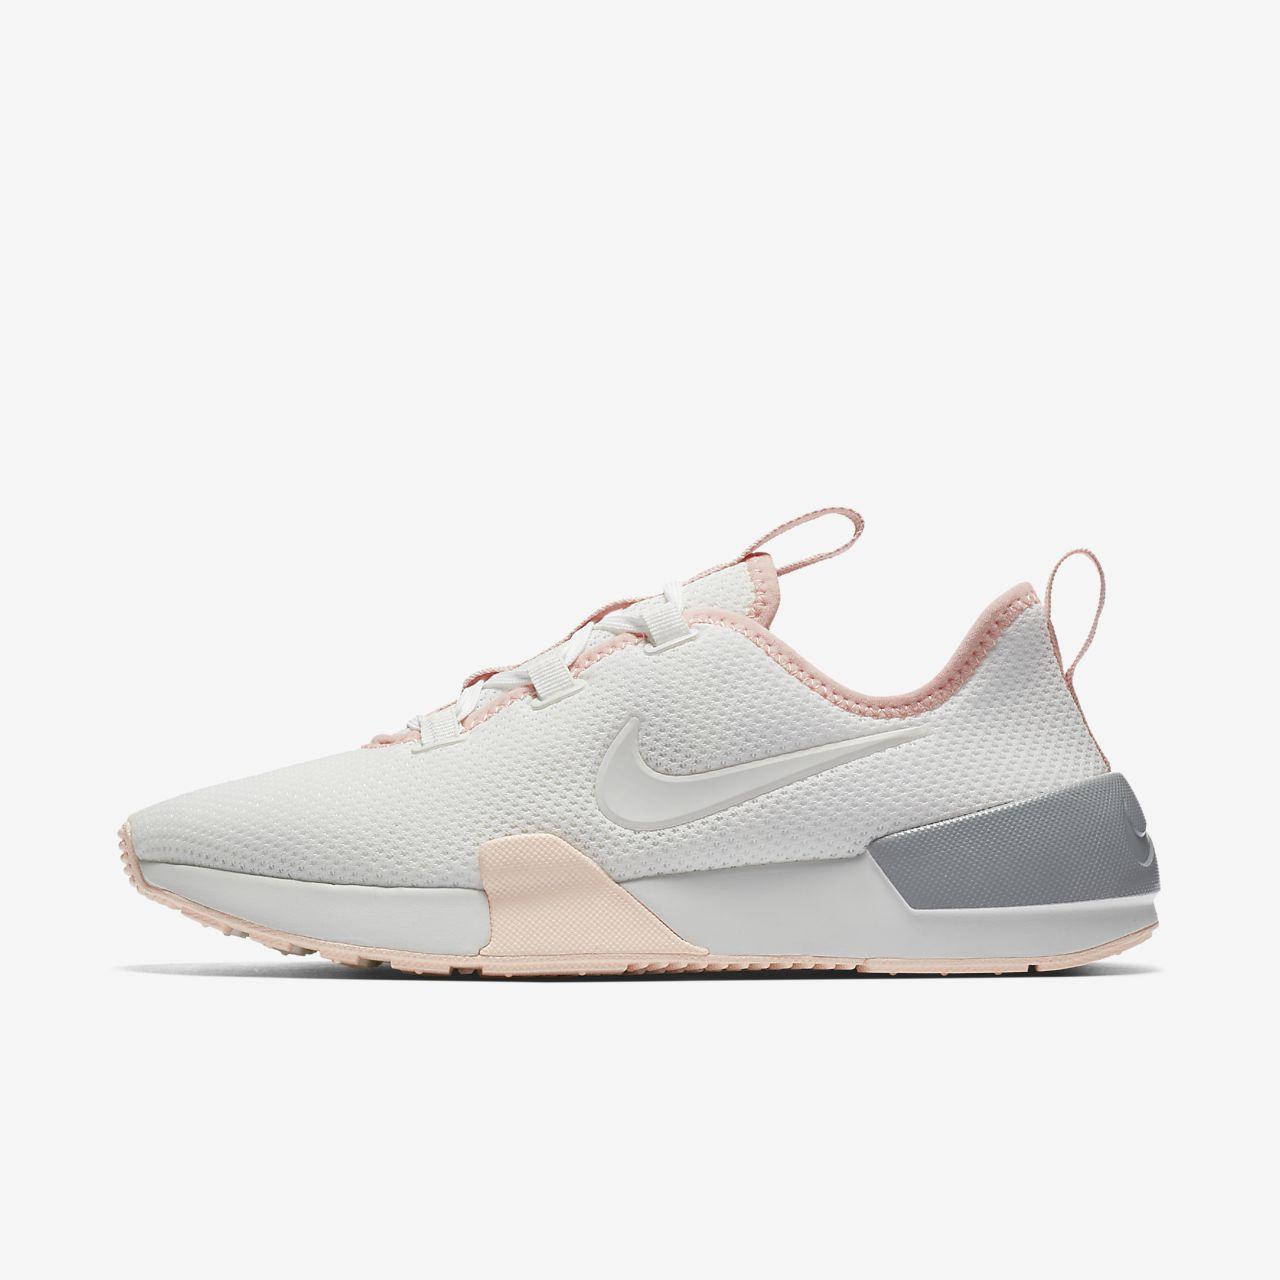 En Ligne Nike Ashin Moderne La Fourniture oR7D87a5lL